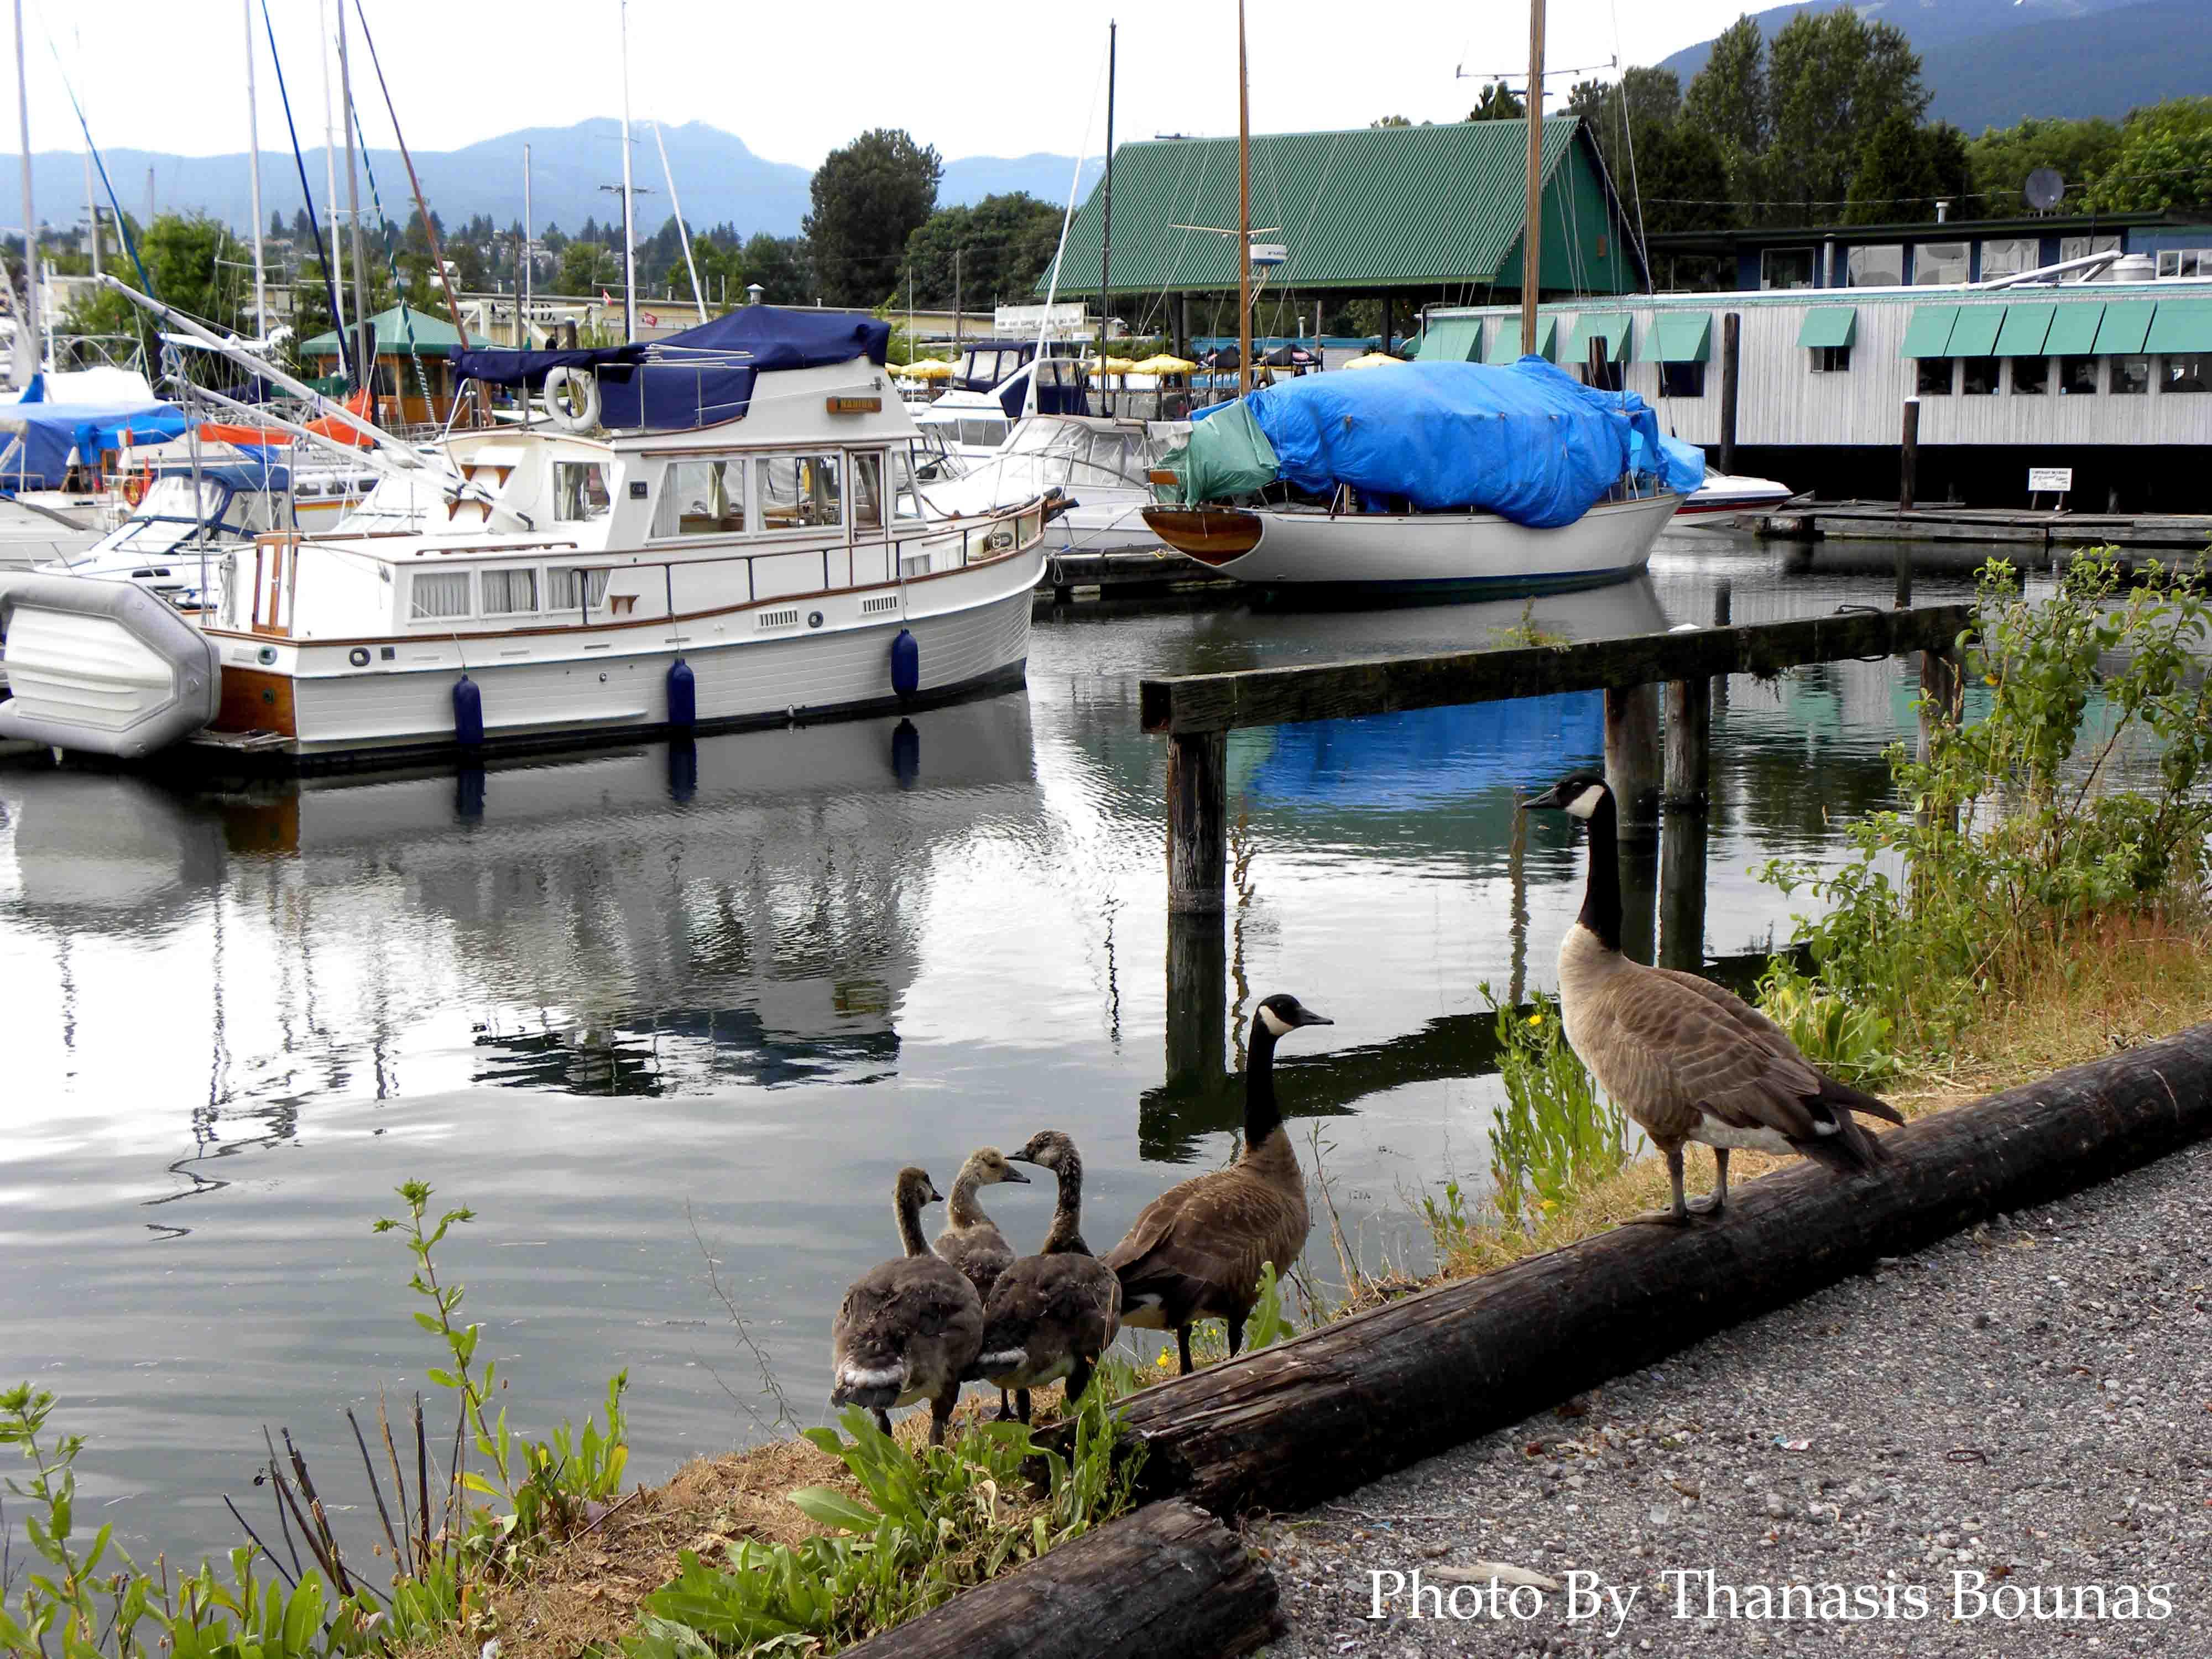 18 North Vancouver Beautiful British Columbia Photo By Thanasis Bounas